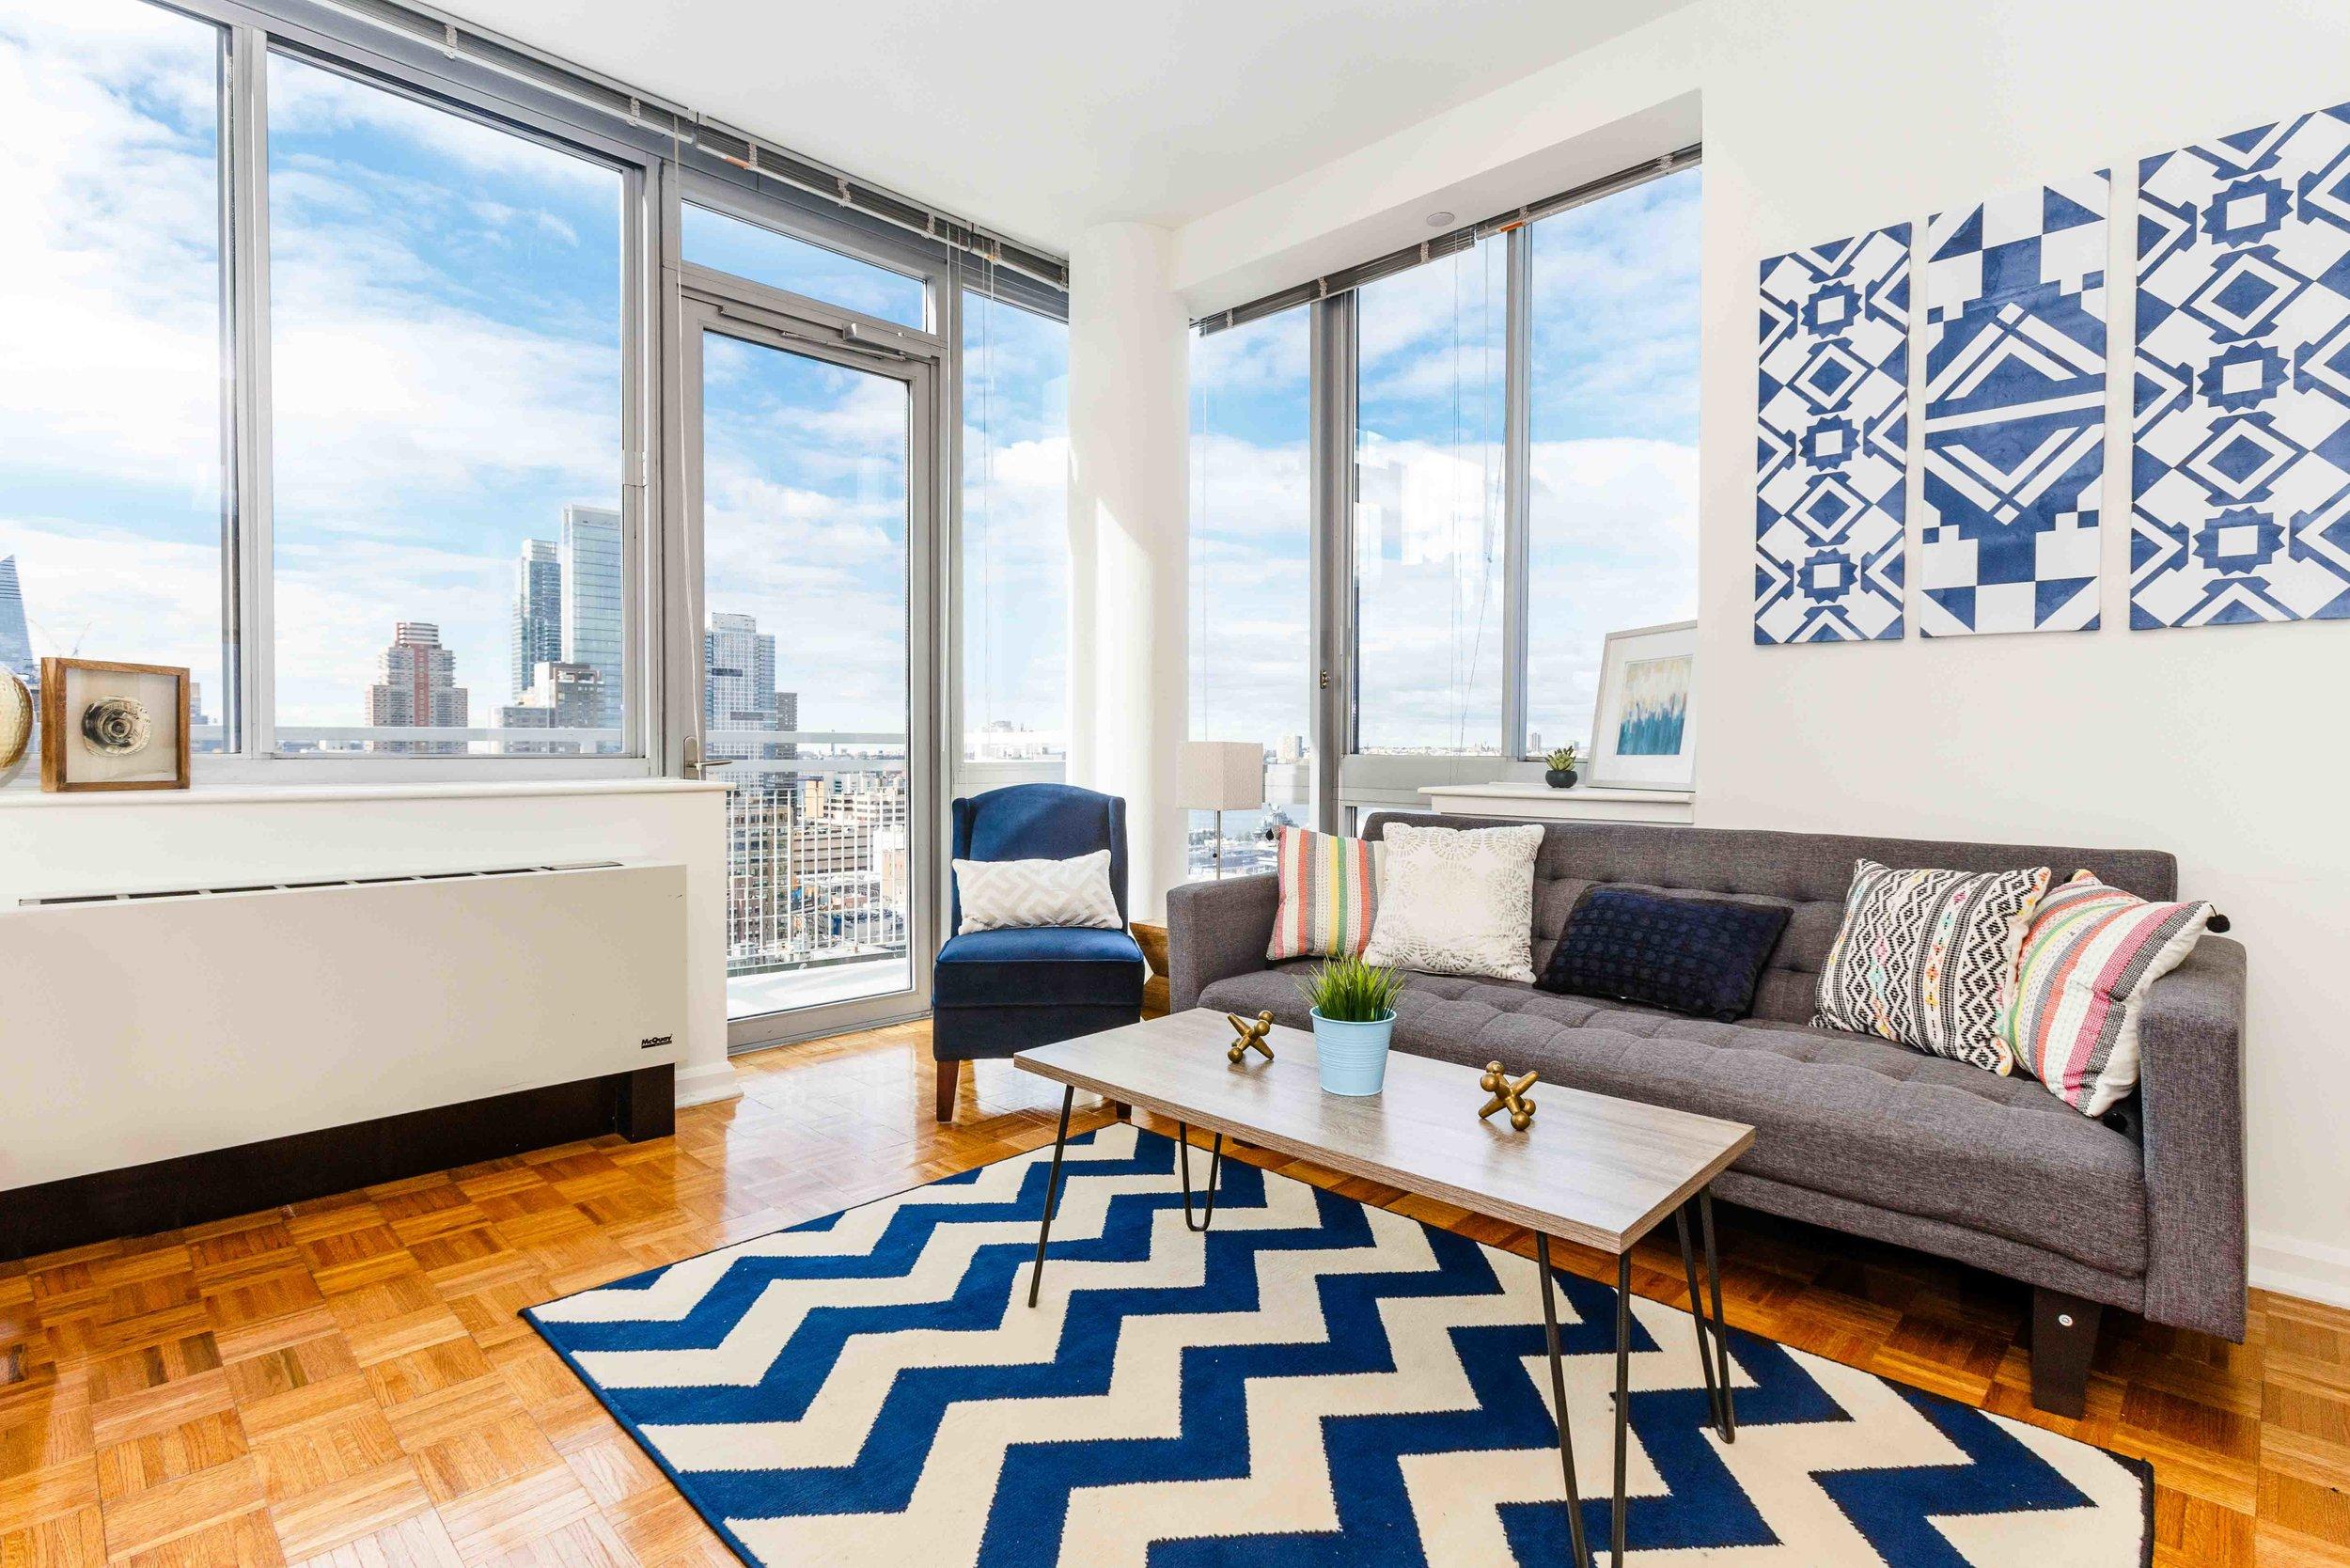 london-property-photos-photography-tottenham-living-room.jpg